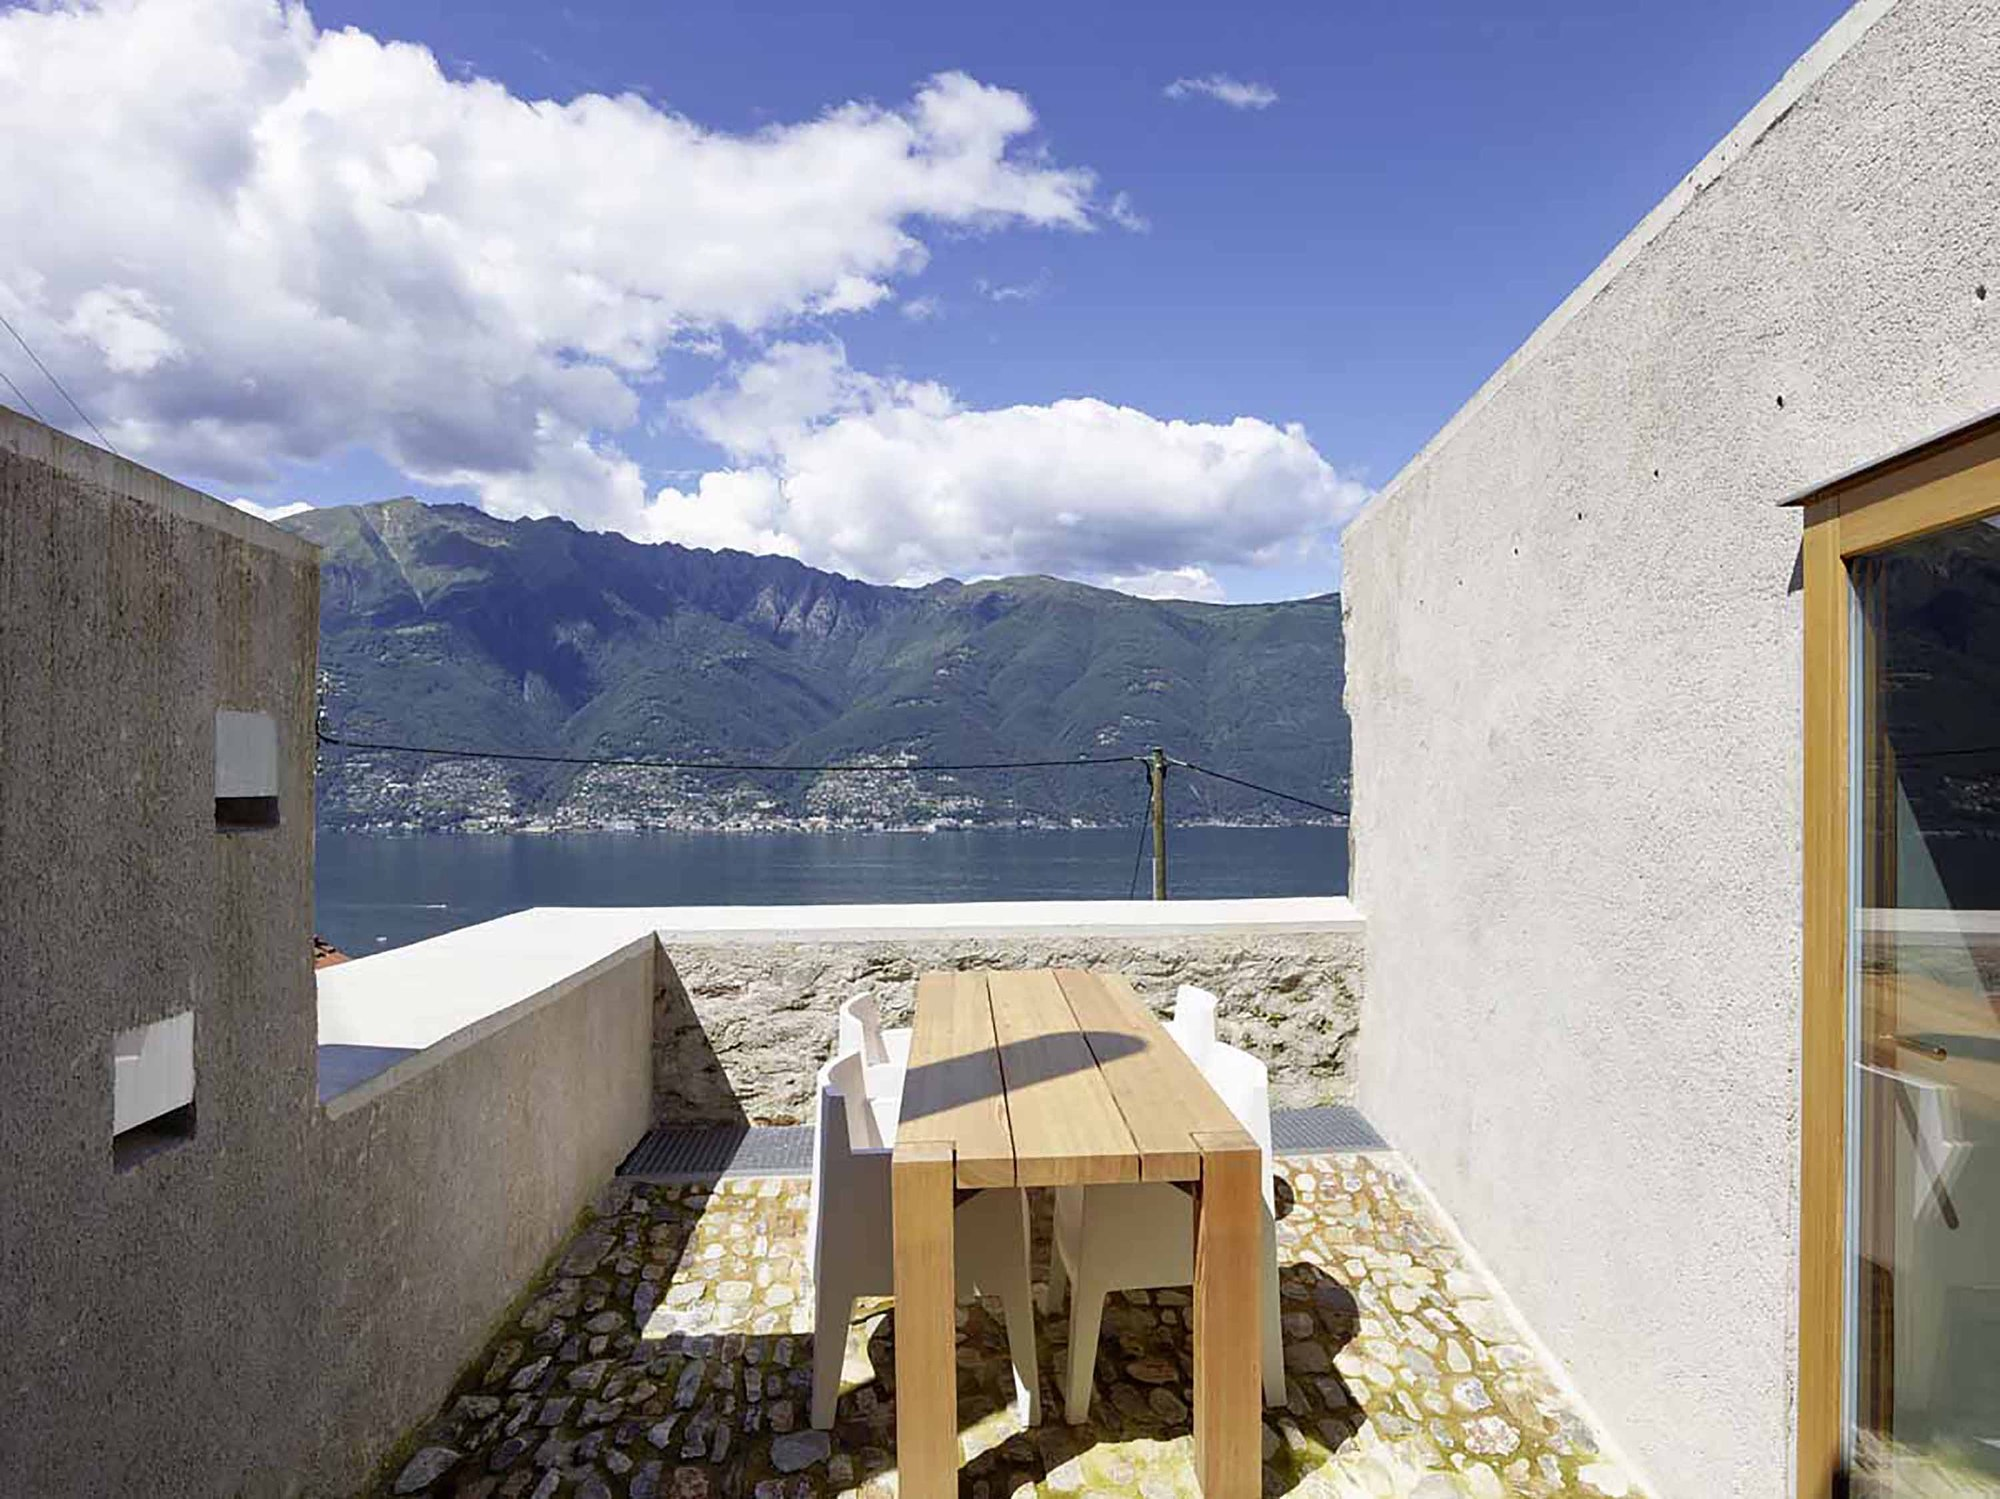 543dd59ec07a802a69000255_stone-house-transformation-in-scaiano-wespi-de-meuron-romeo-architects_1430_cf029918.jpg